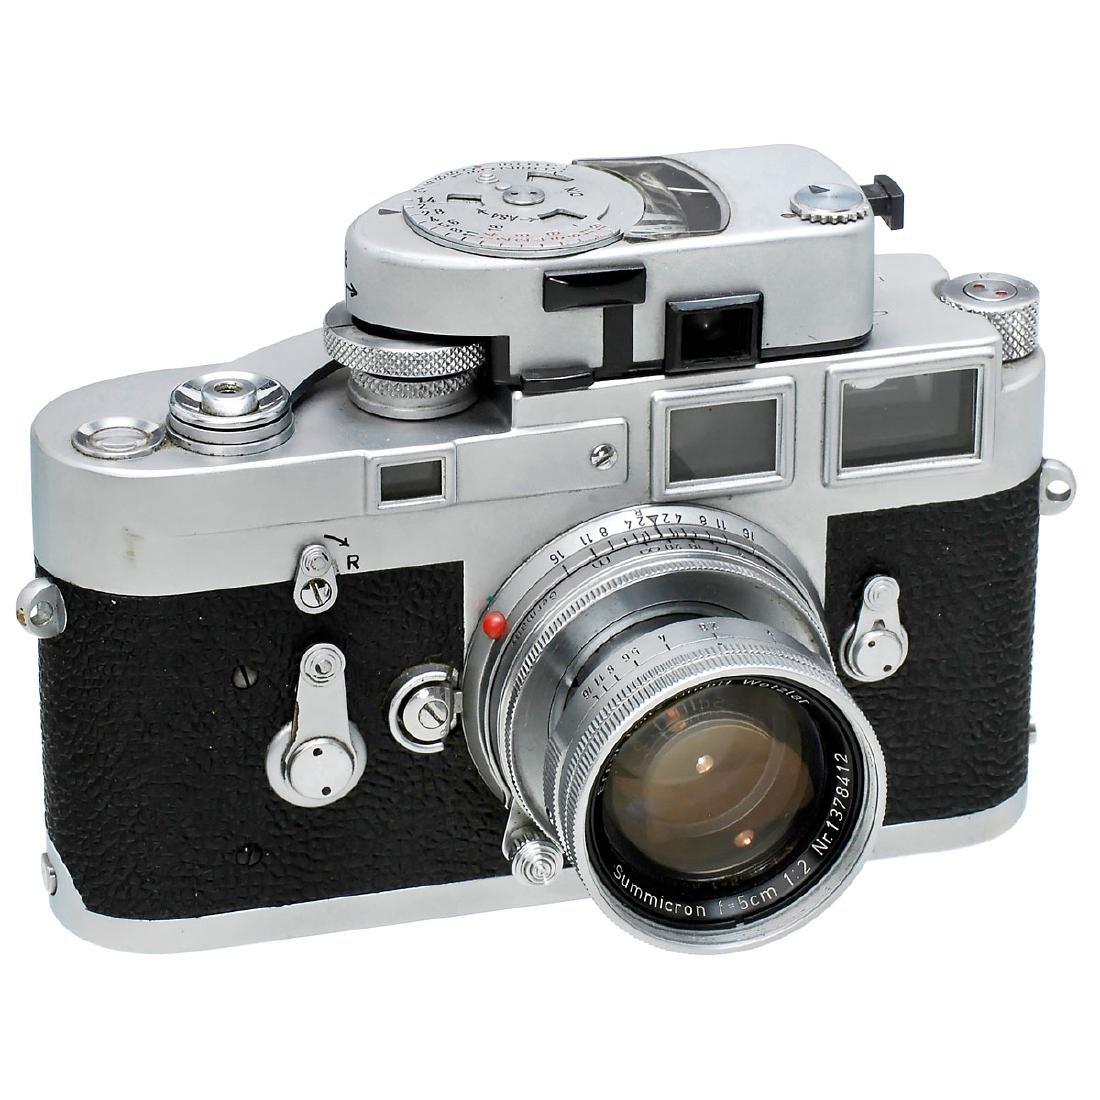 Leica M3 with Summicron 2/5 cm, 1962